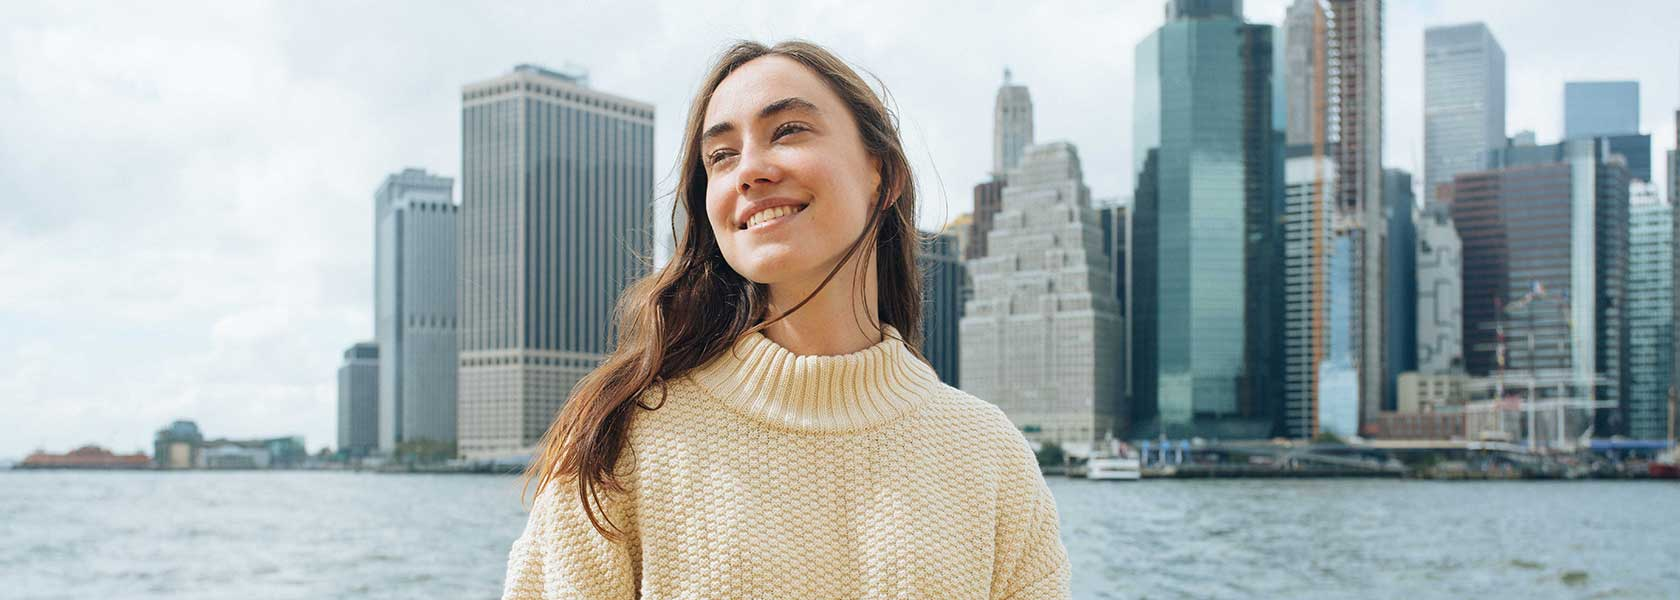 Frau in beigem Strickpullover vor New Yorker Skyline